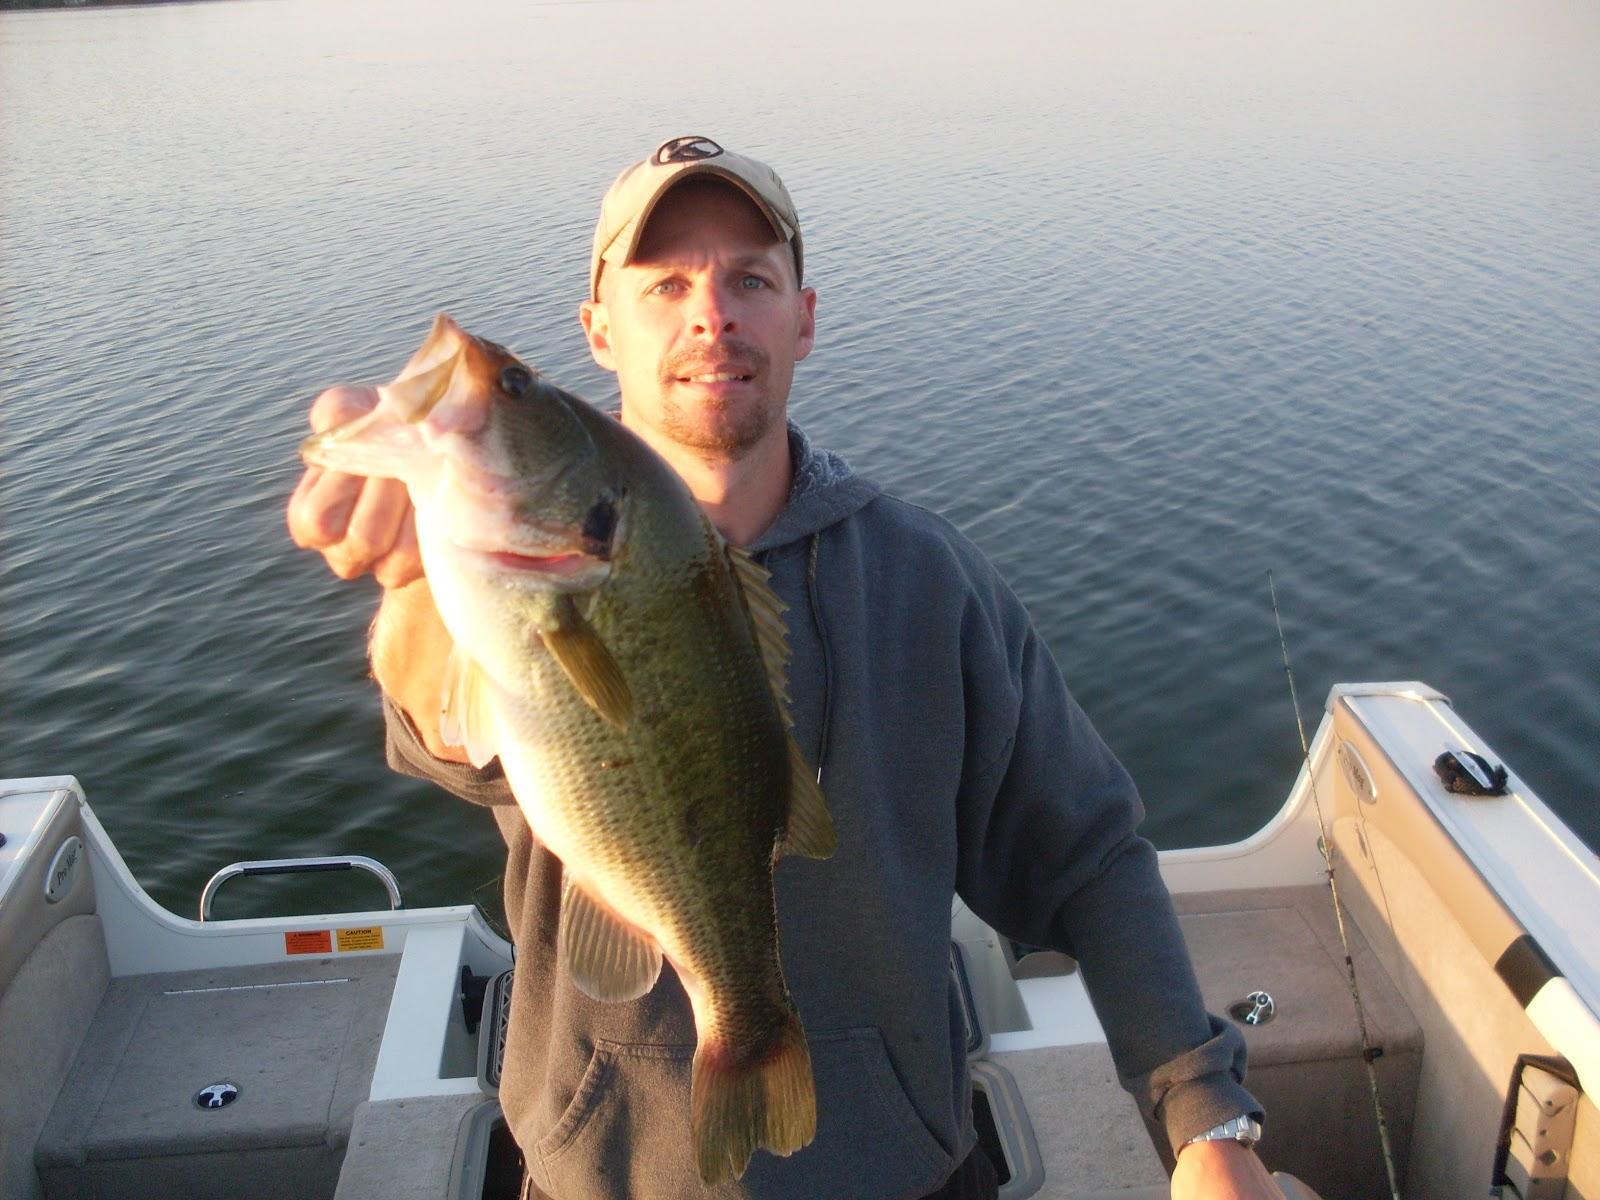 Take the bait guide service on lake minnetonka lake for Lake minnetonka fishing report